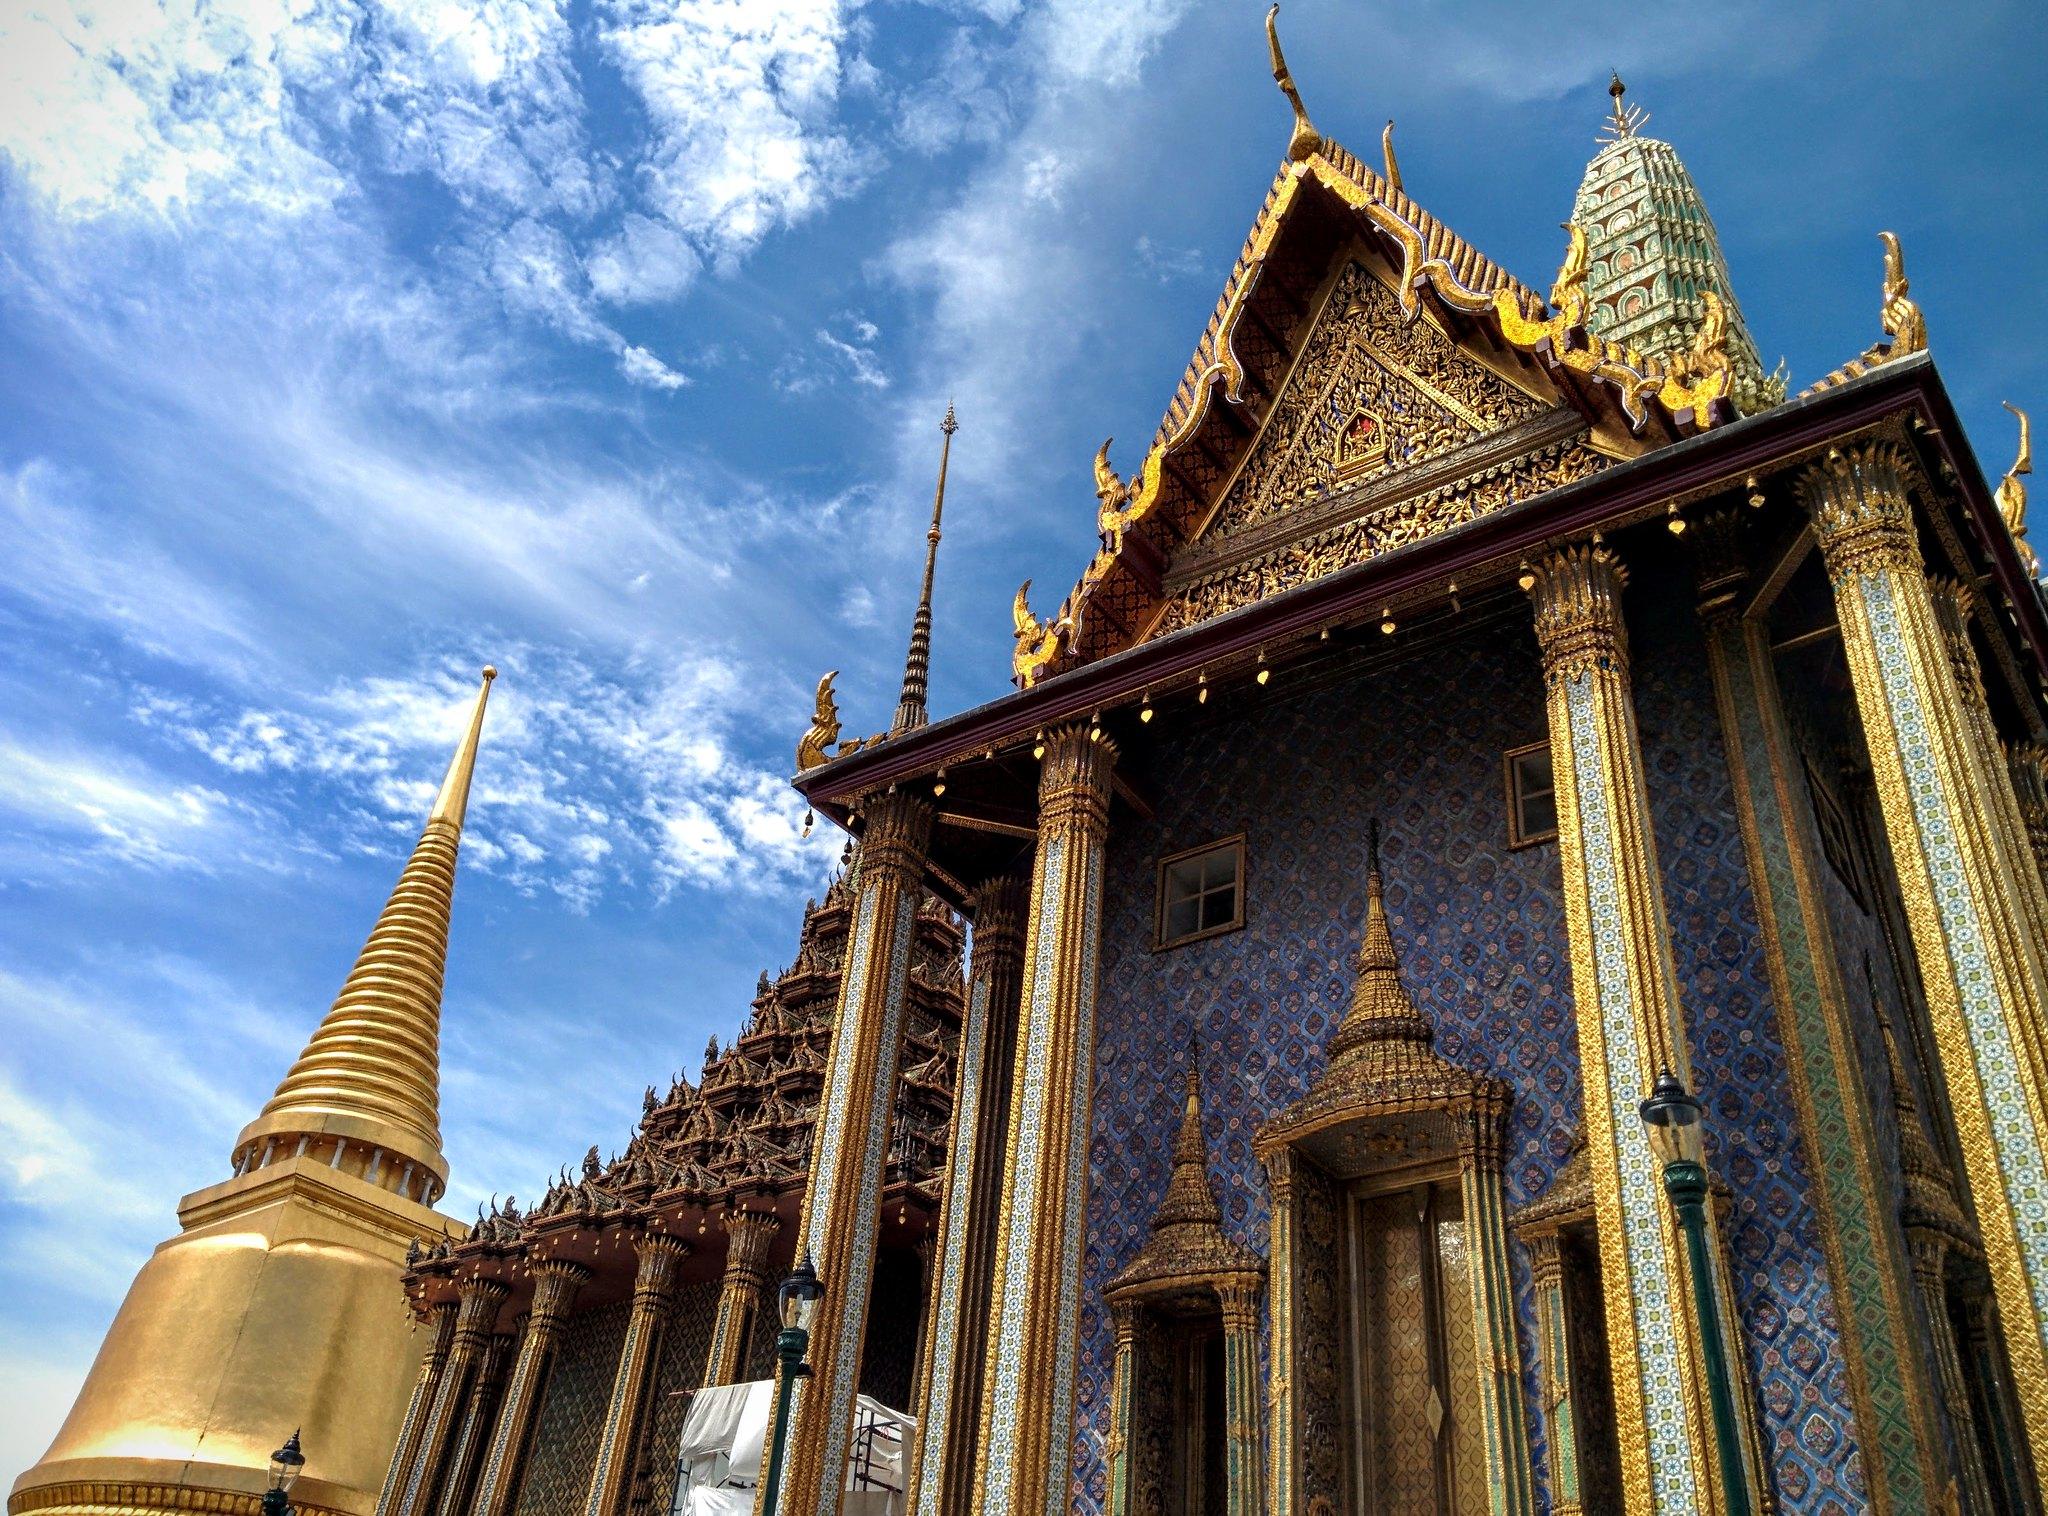 A golden temple against the blue sky